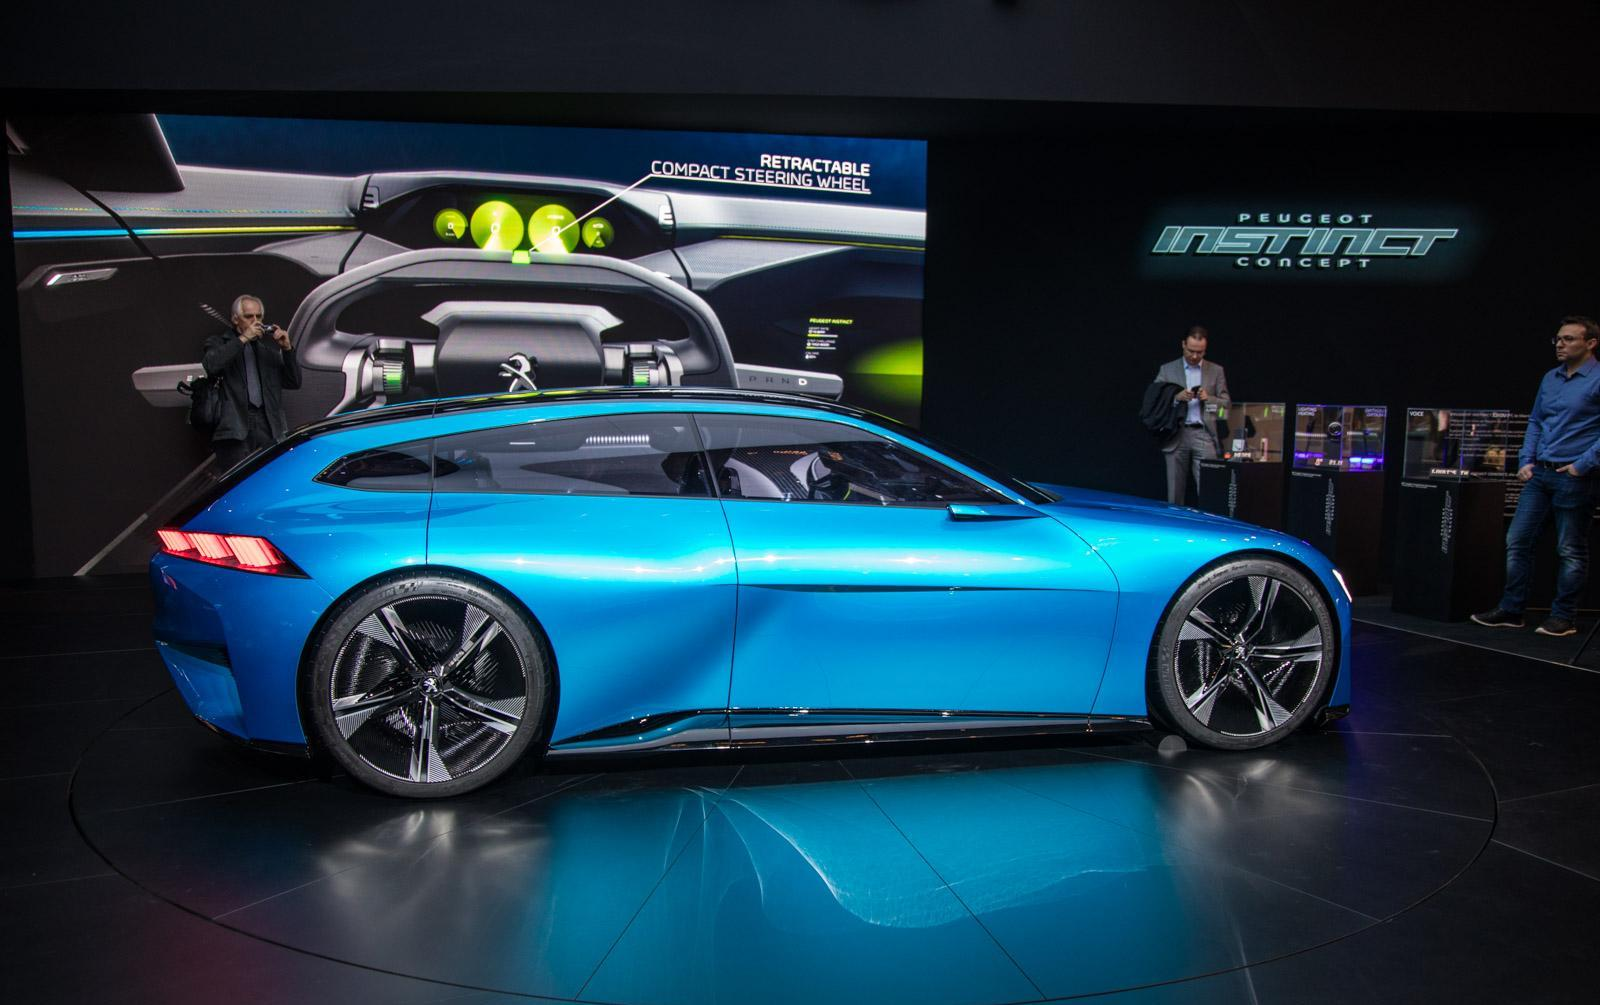 Peugeot-instinct-concept-021